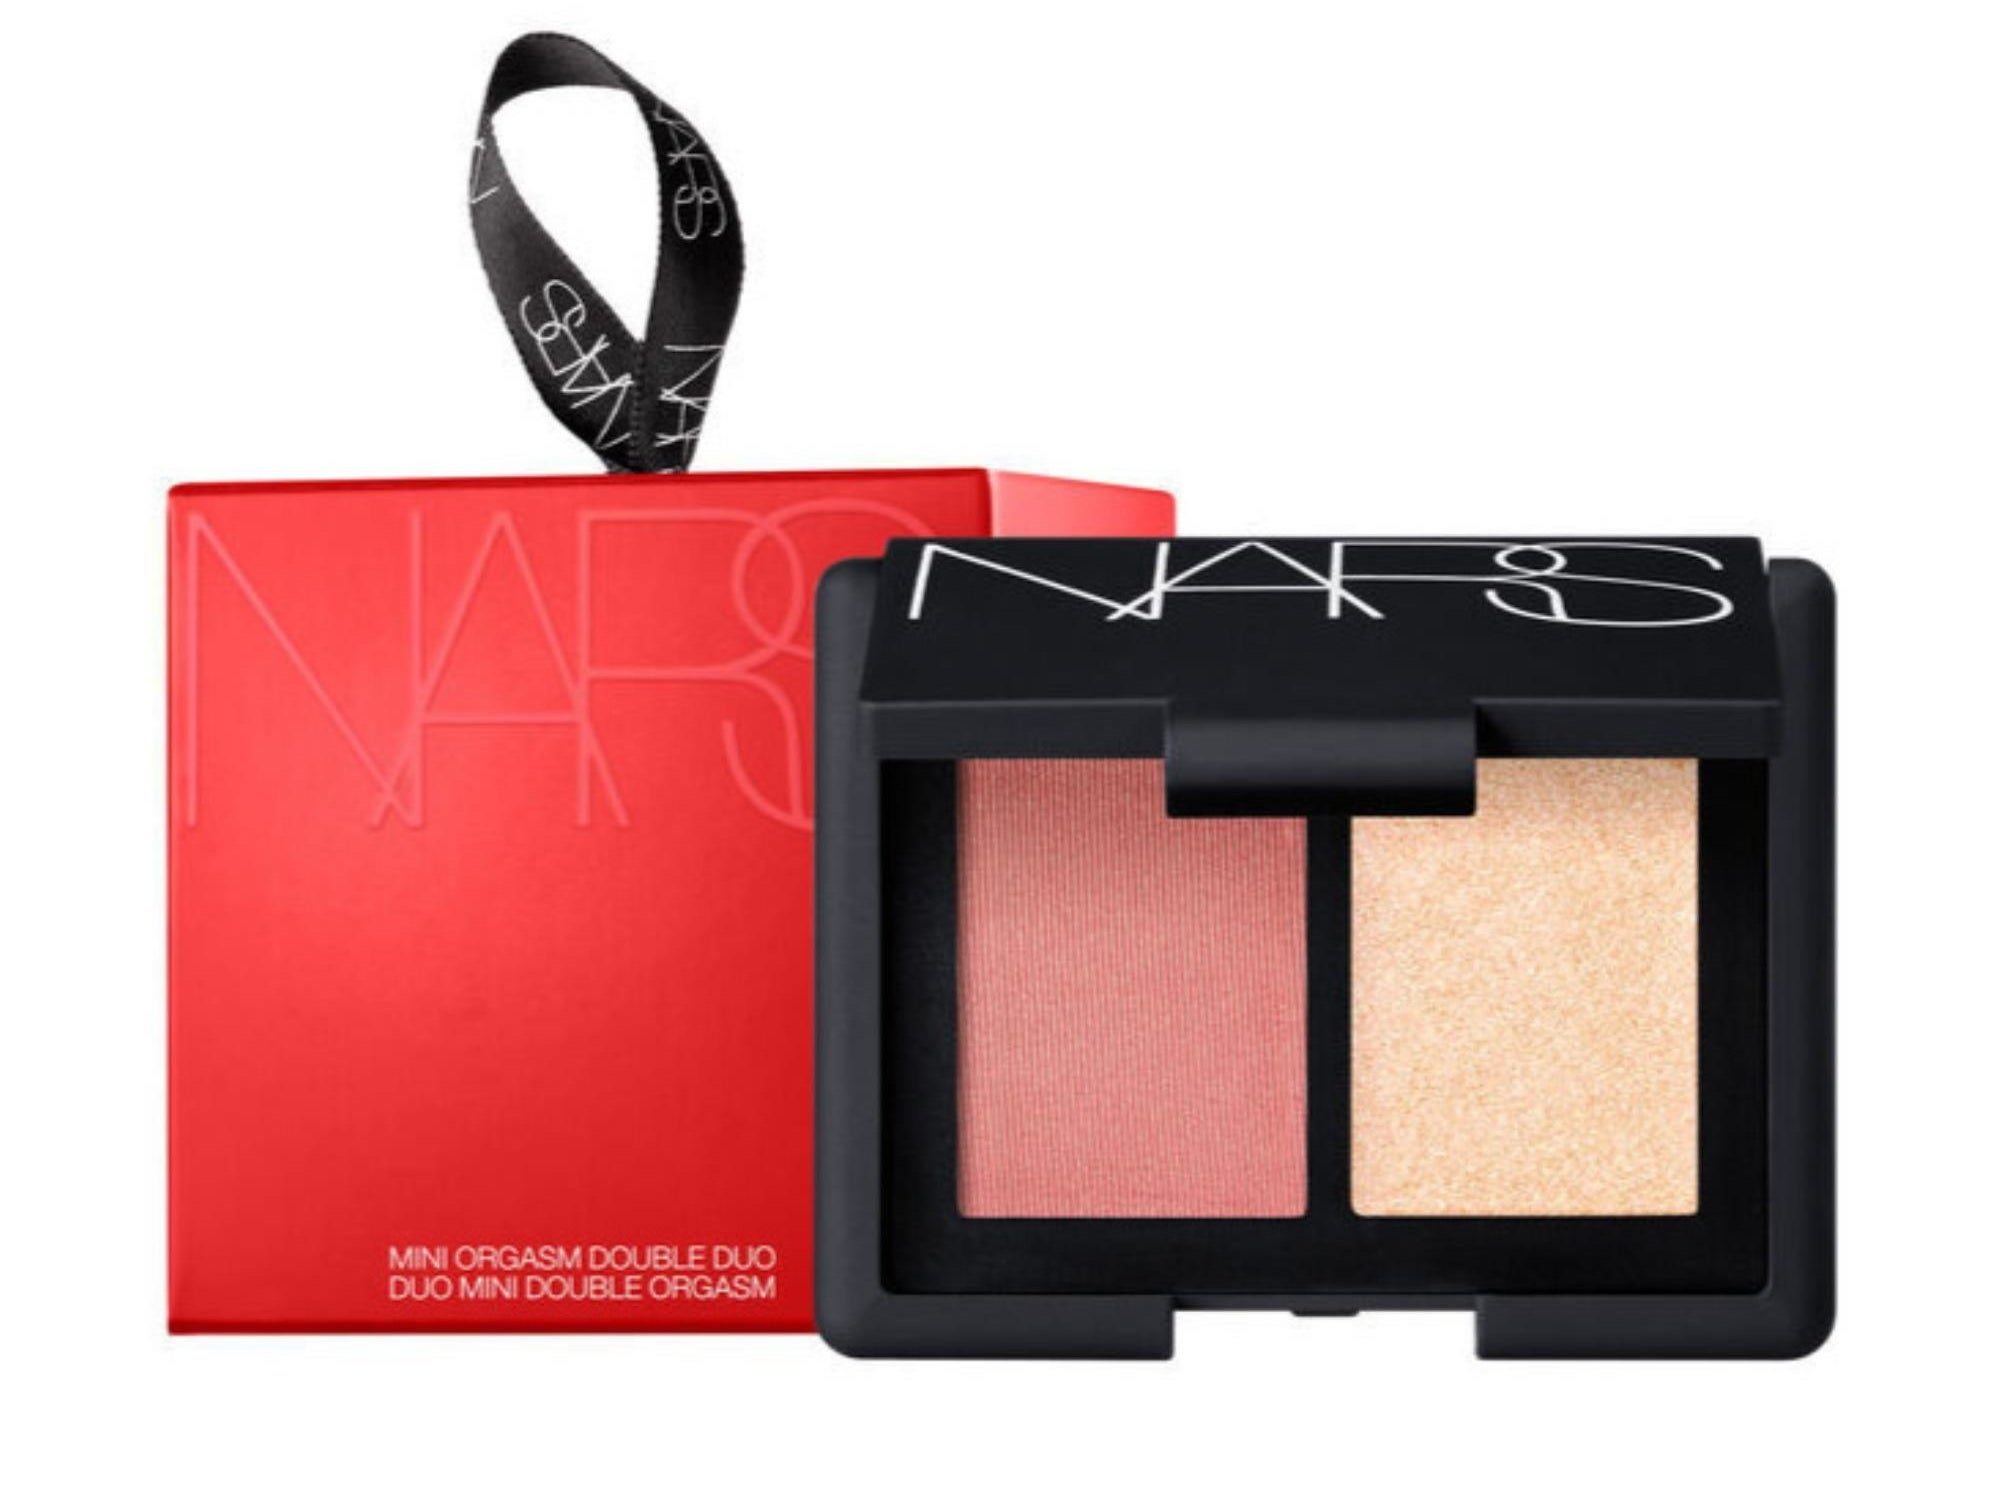 TheNARS blush/highlighter duo pack